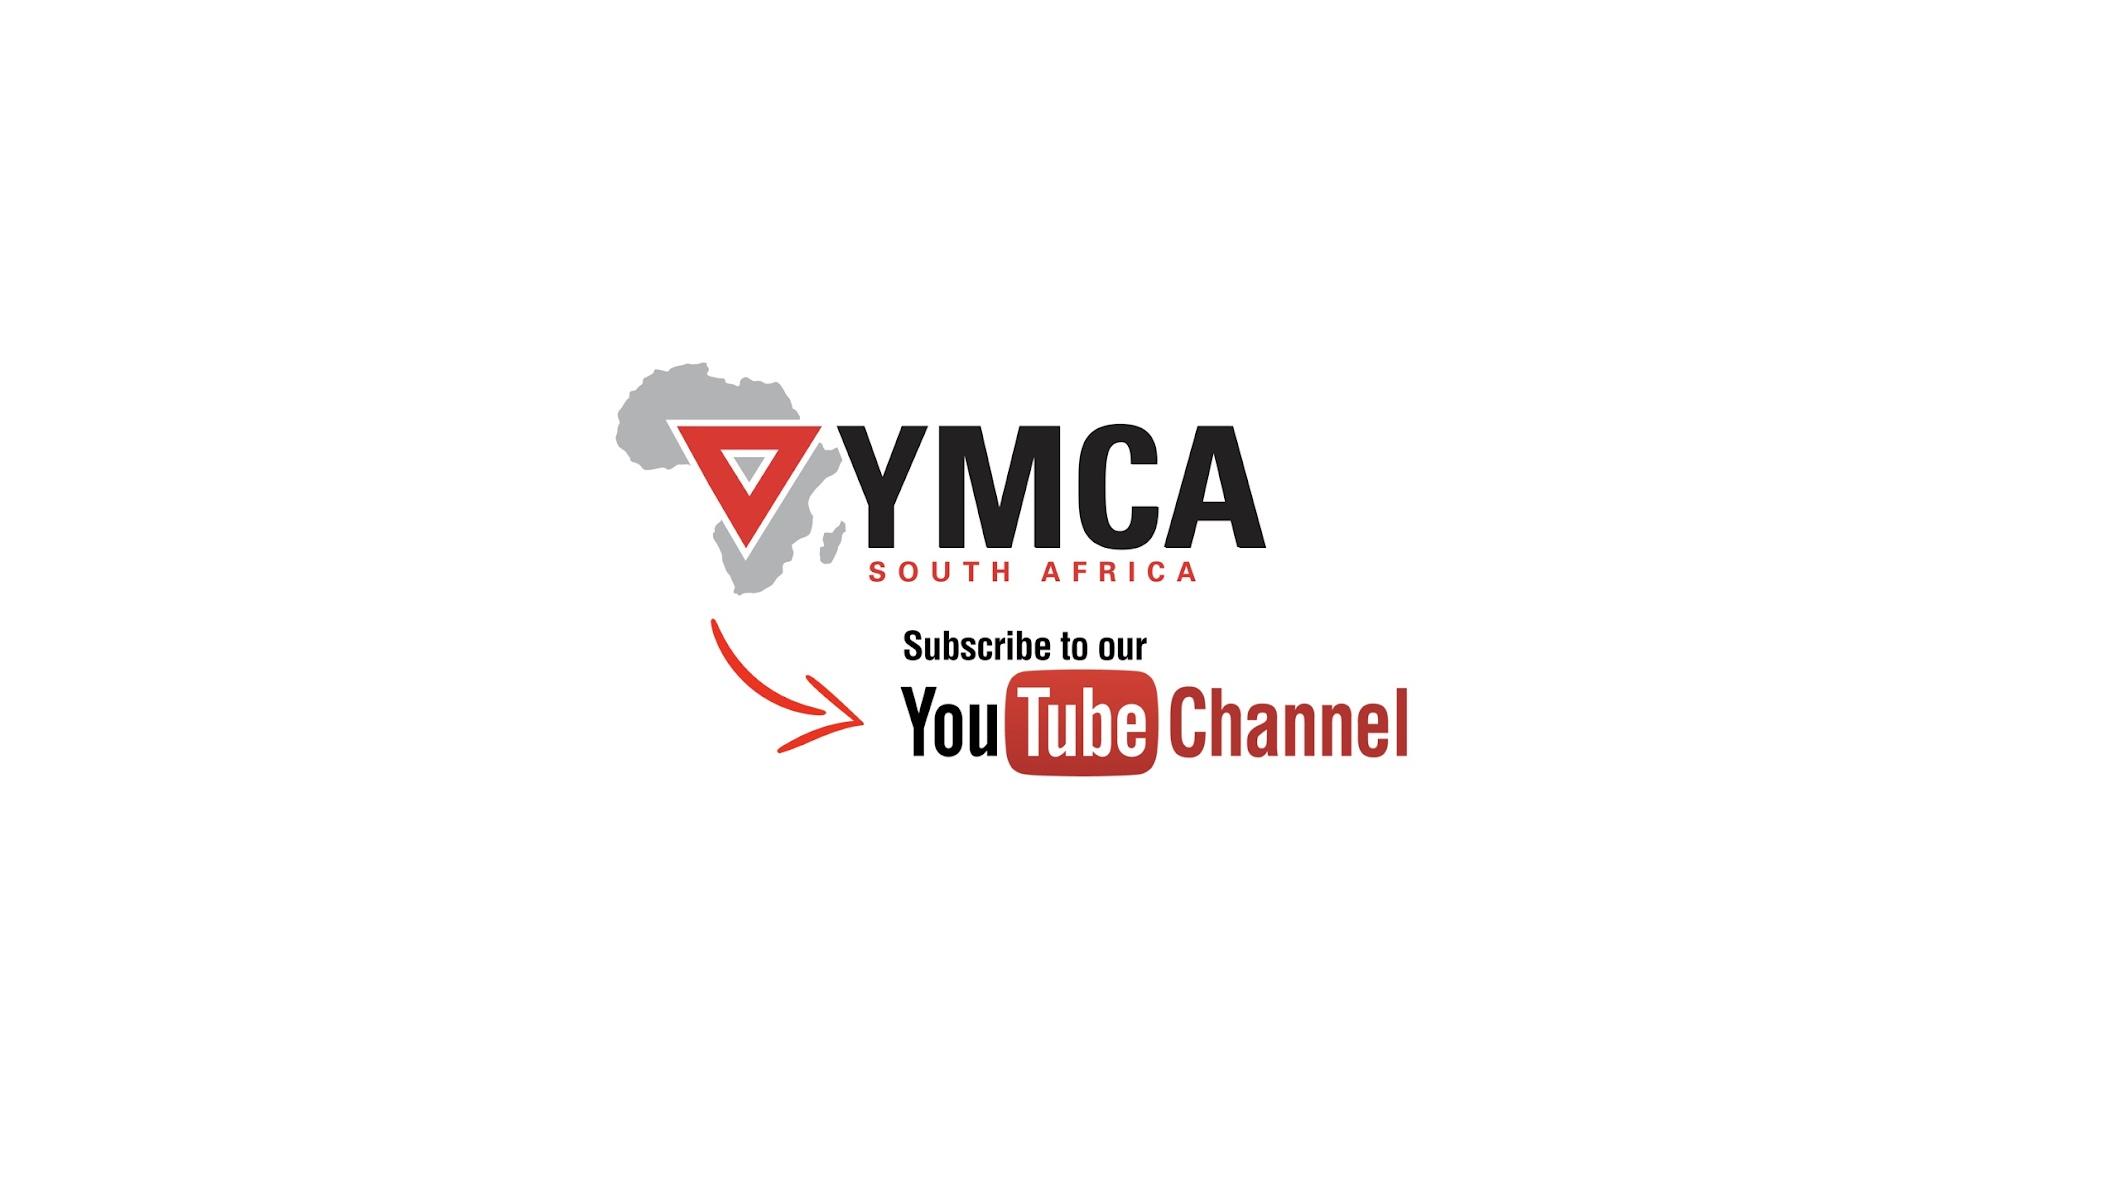 YMCA South Africa